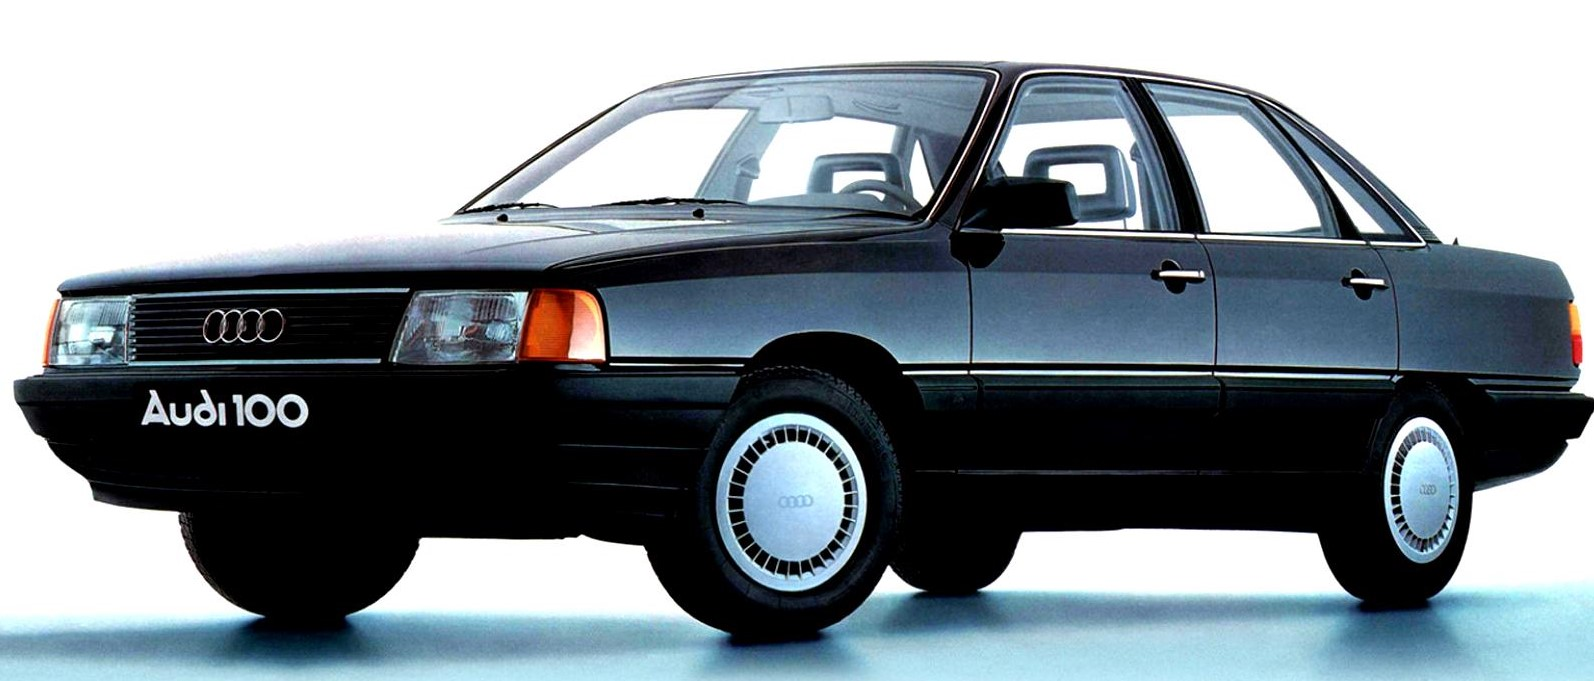 Audi 100 Owners Workshop Manuals PDF